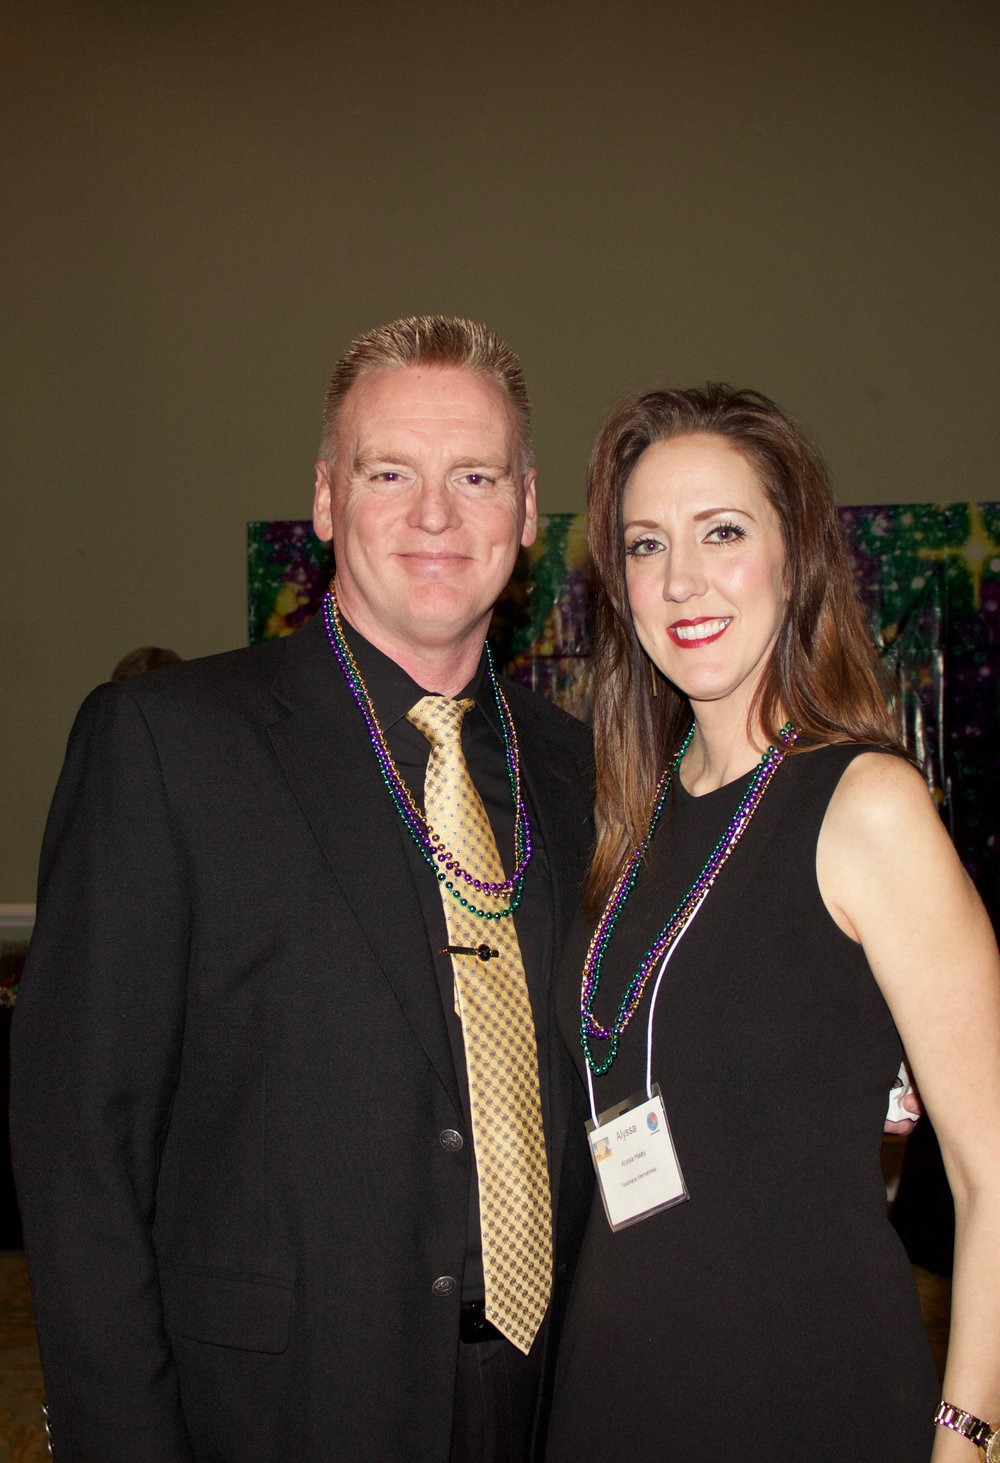 Robert and Alyssa Haley